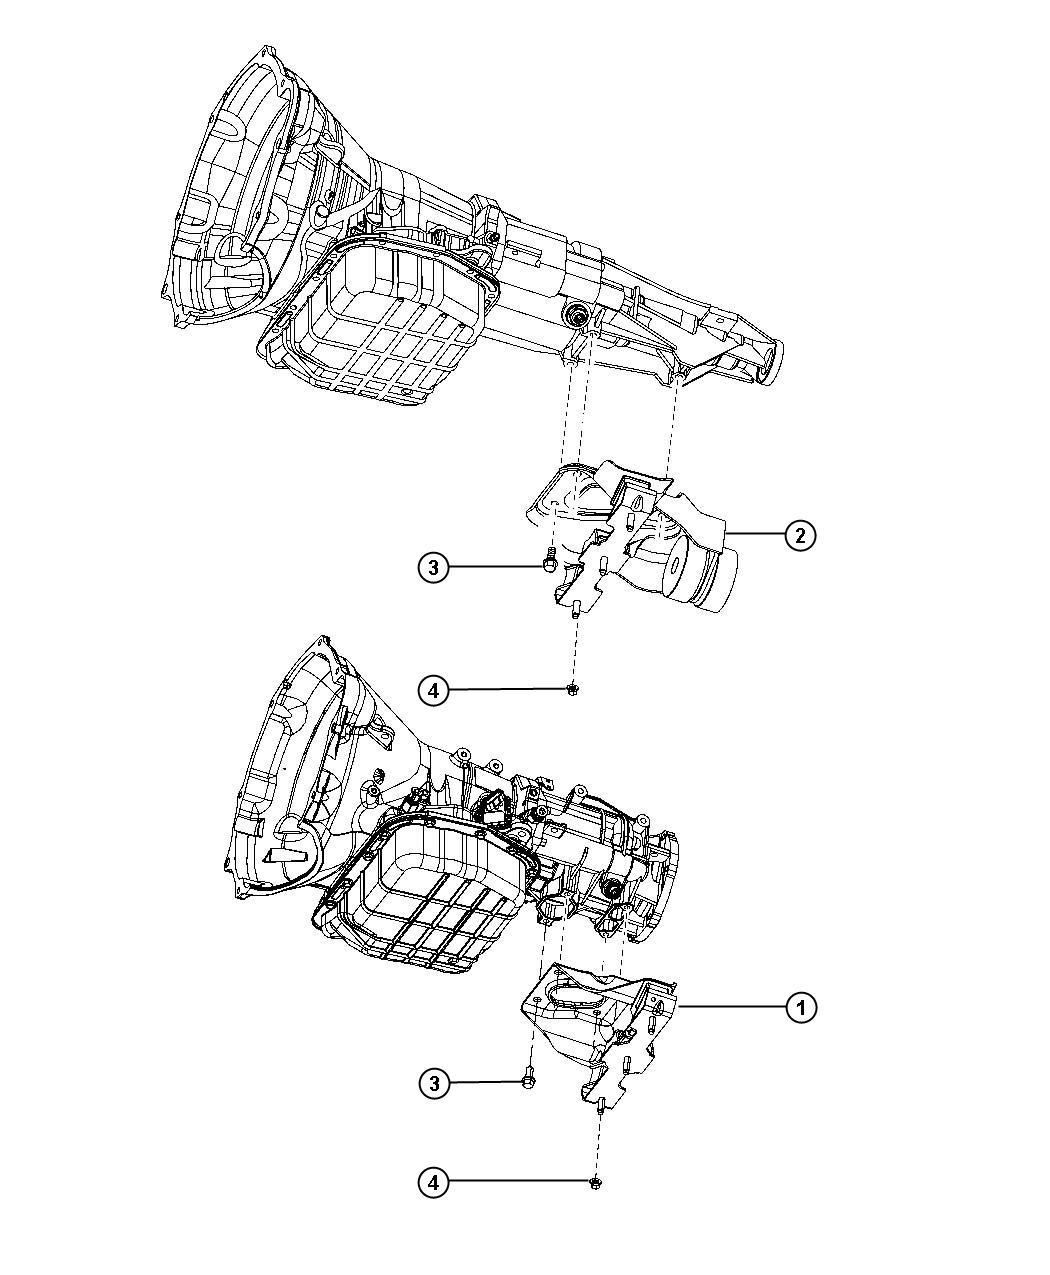 Dodge Ram 2500 Insulator. Transmission support. Engine